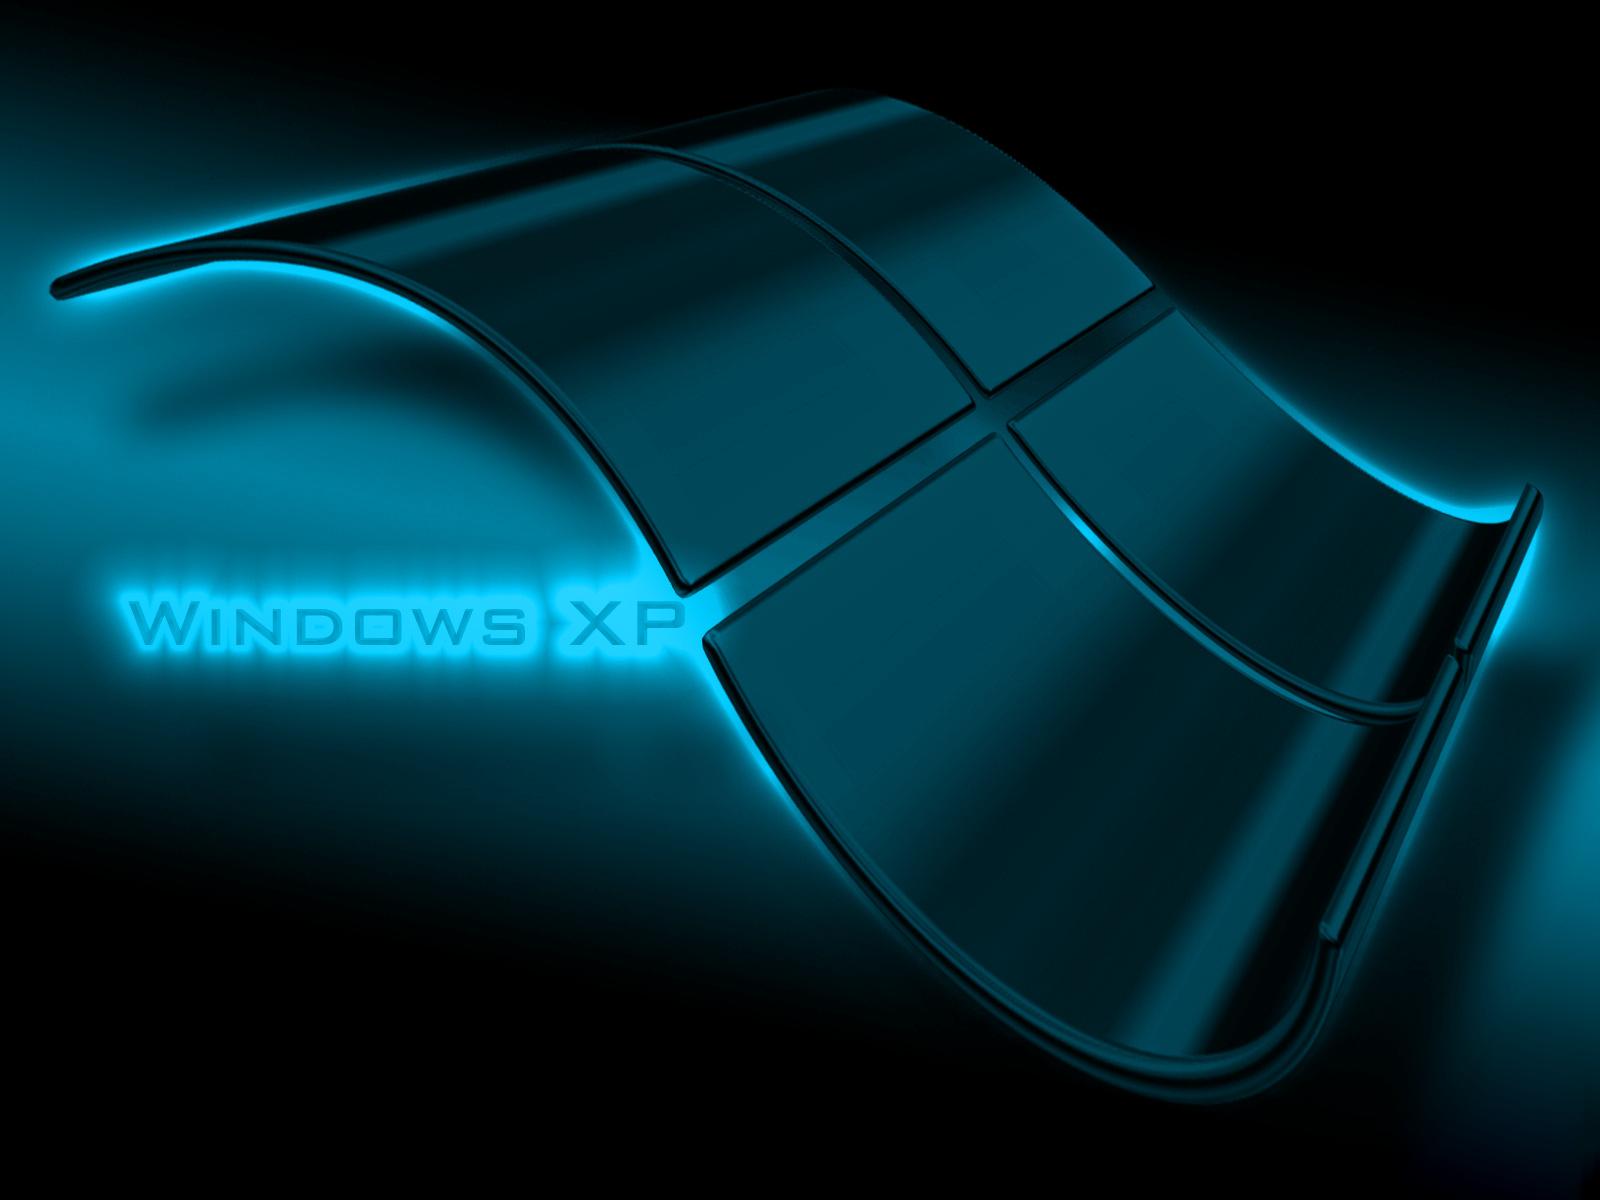 Windows Xp HD Wallpapers - Wallpapers